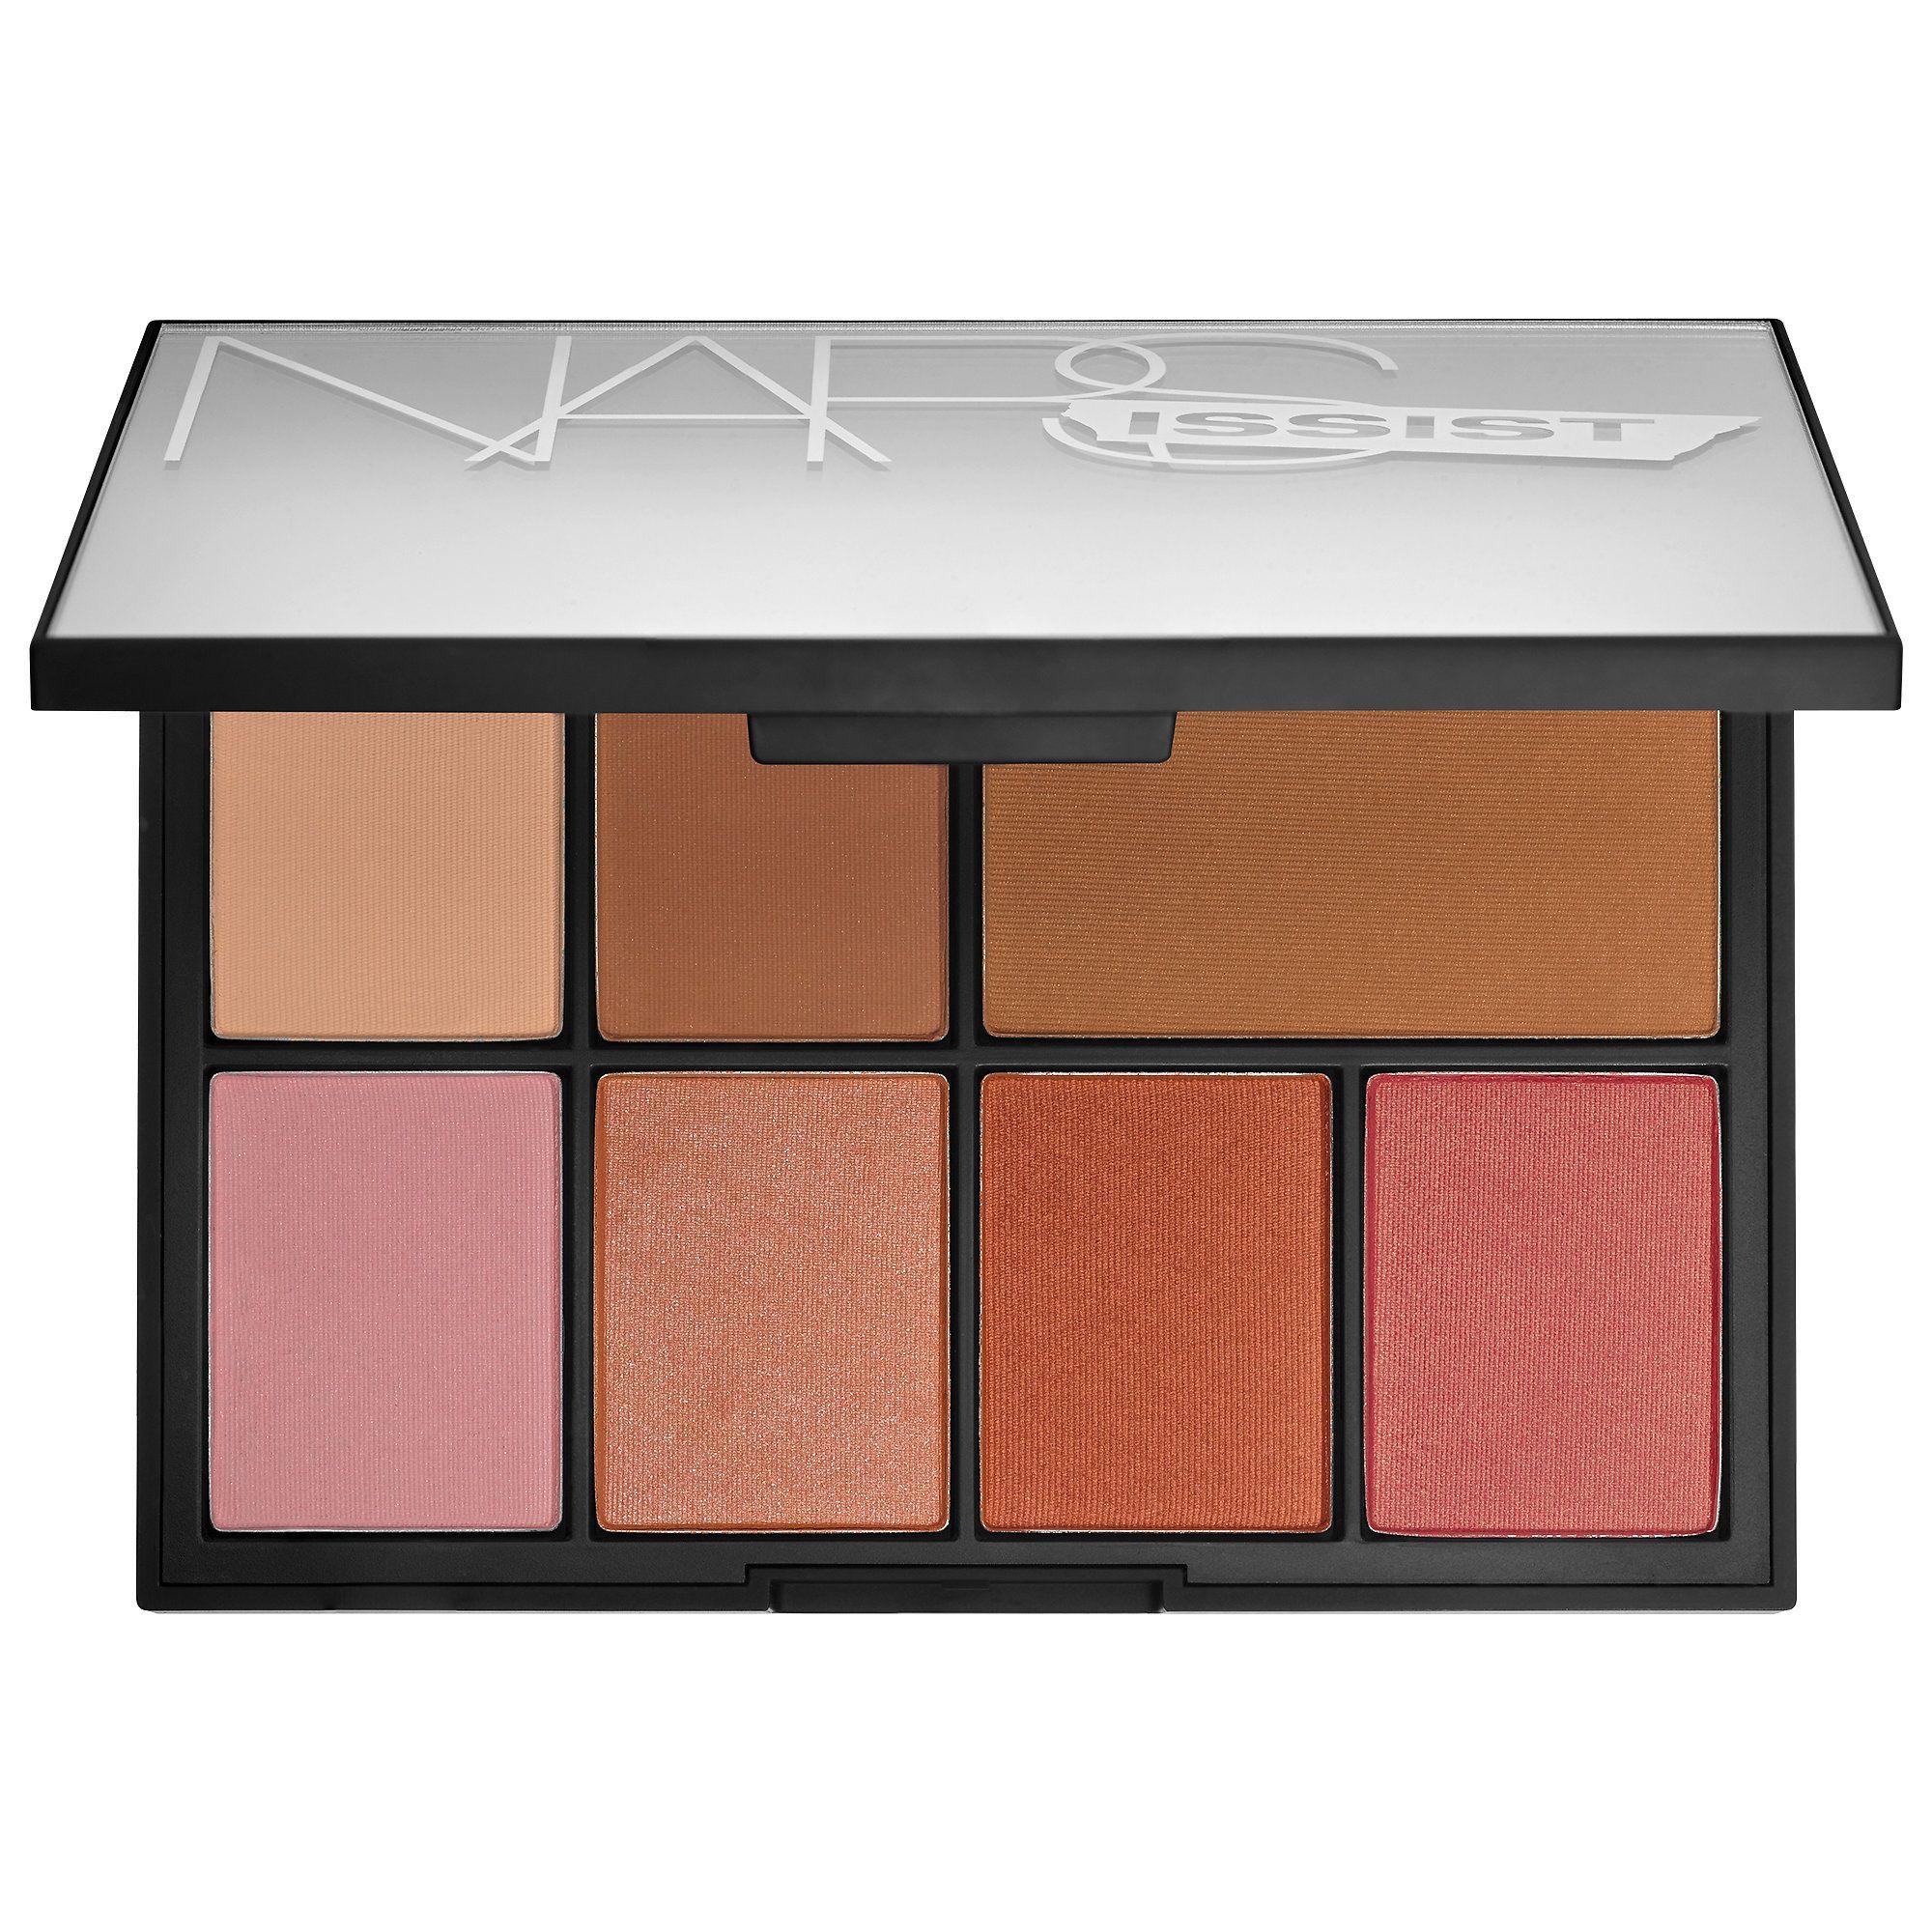 Shop NARS' Cheek Studio Palette at Sephora. It has four